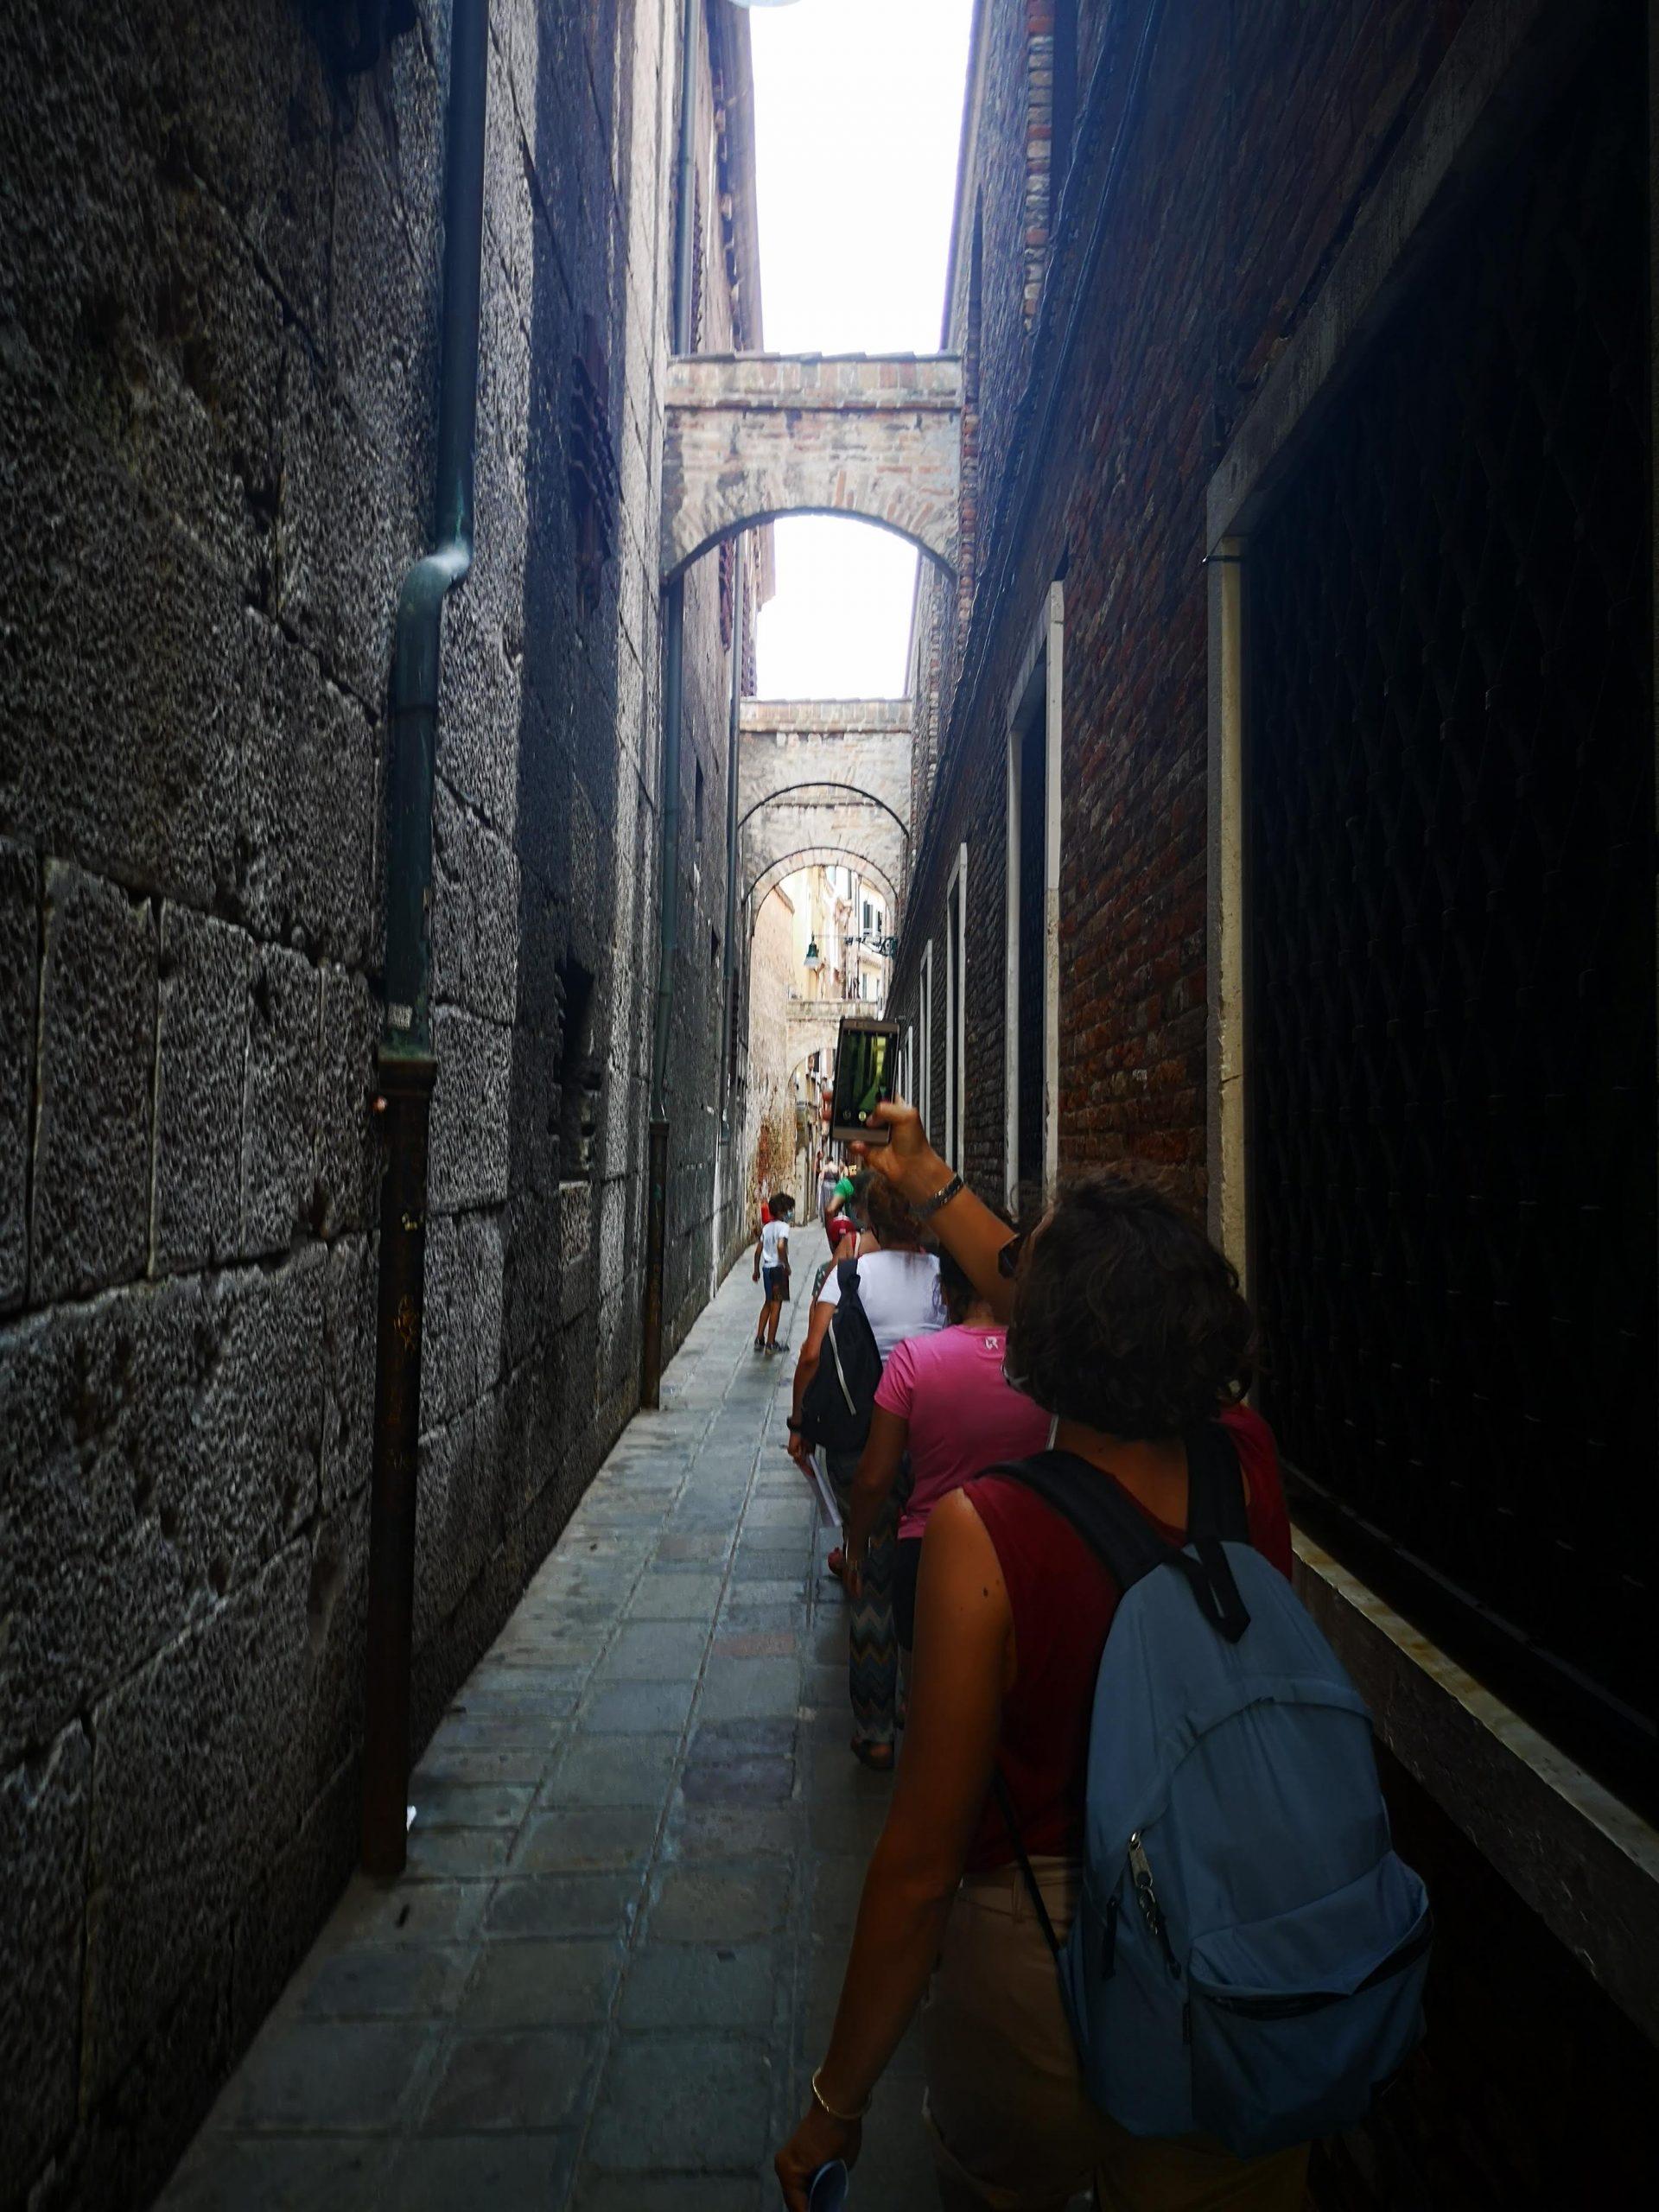 Anma Venezia a venezia per i bambini